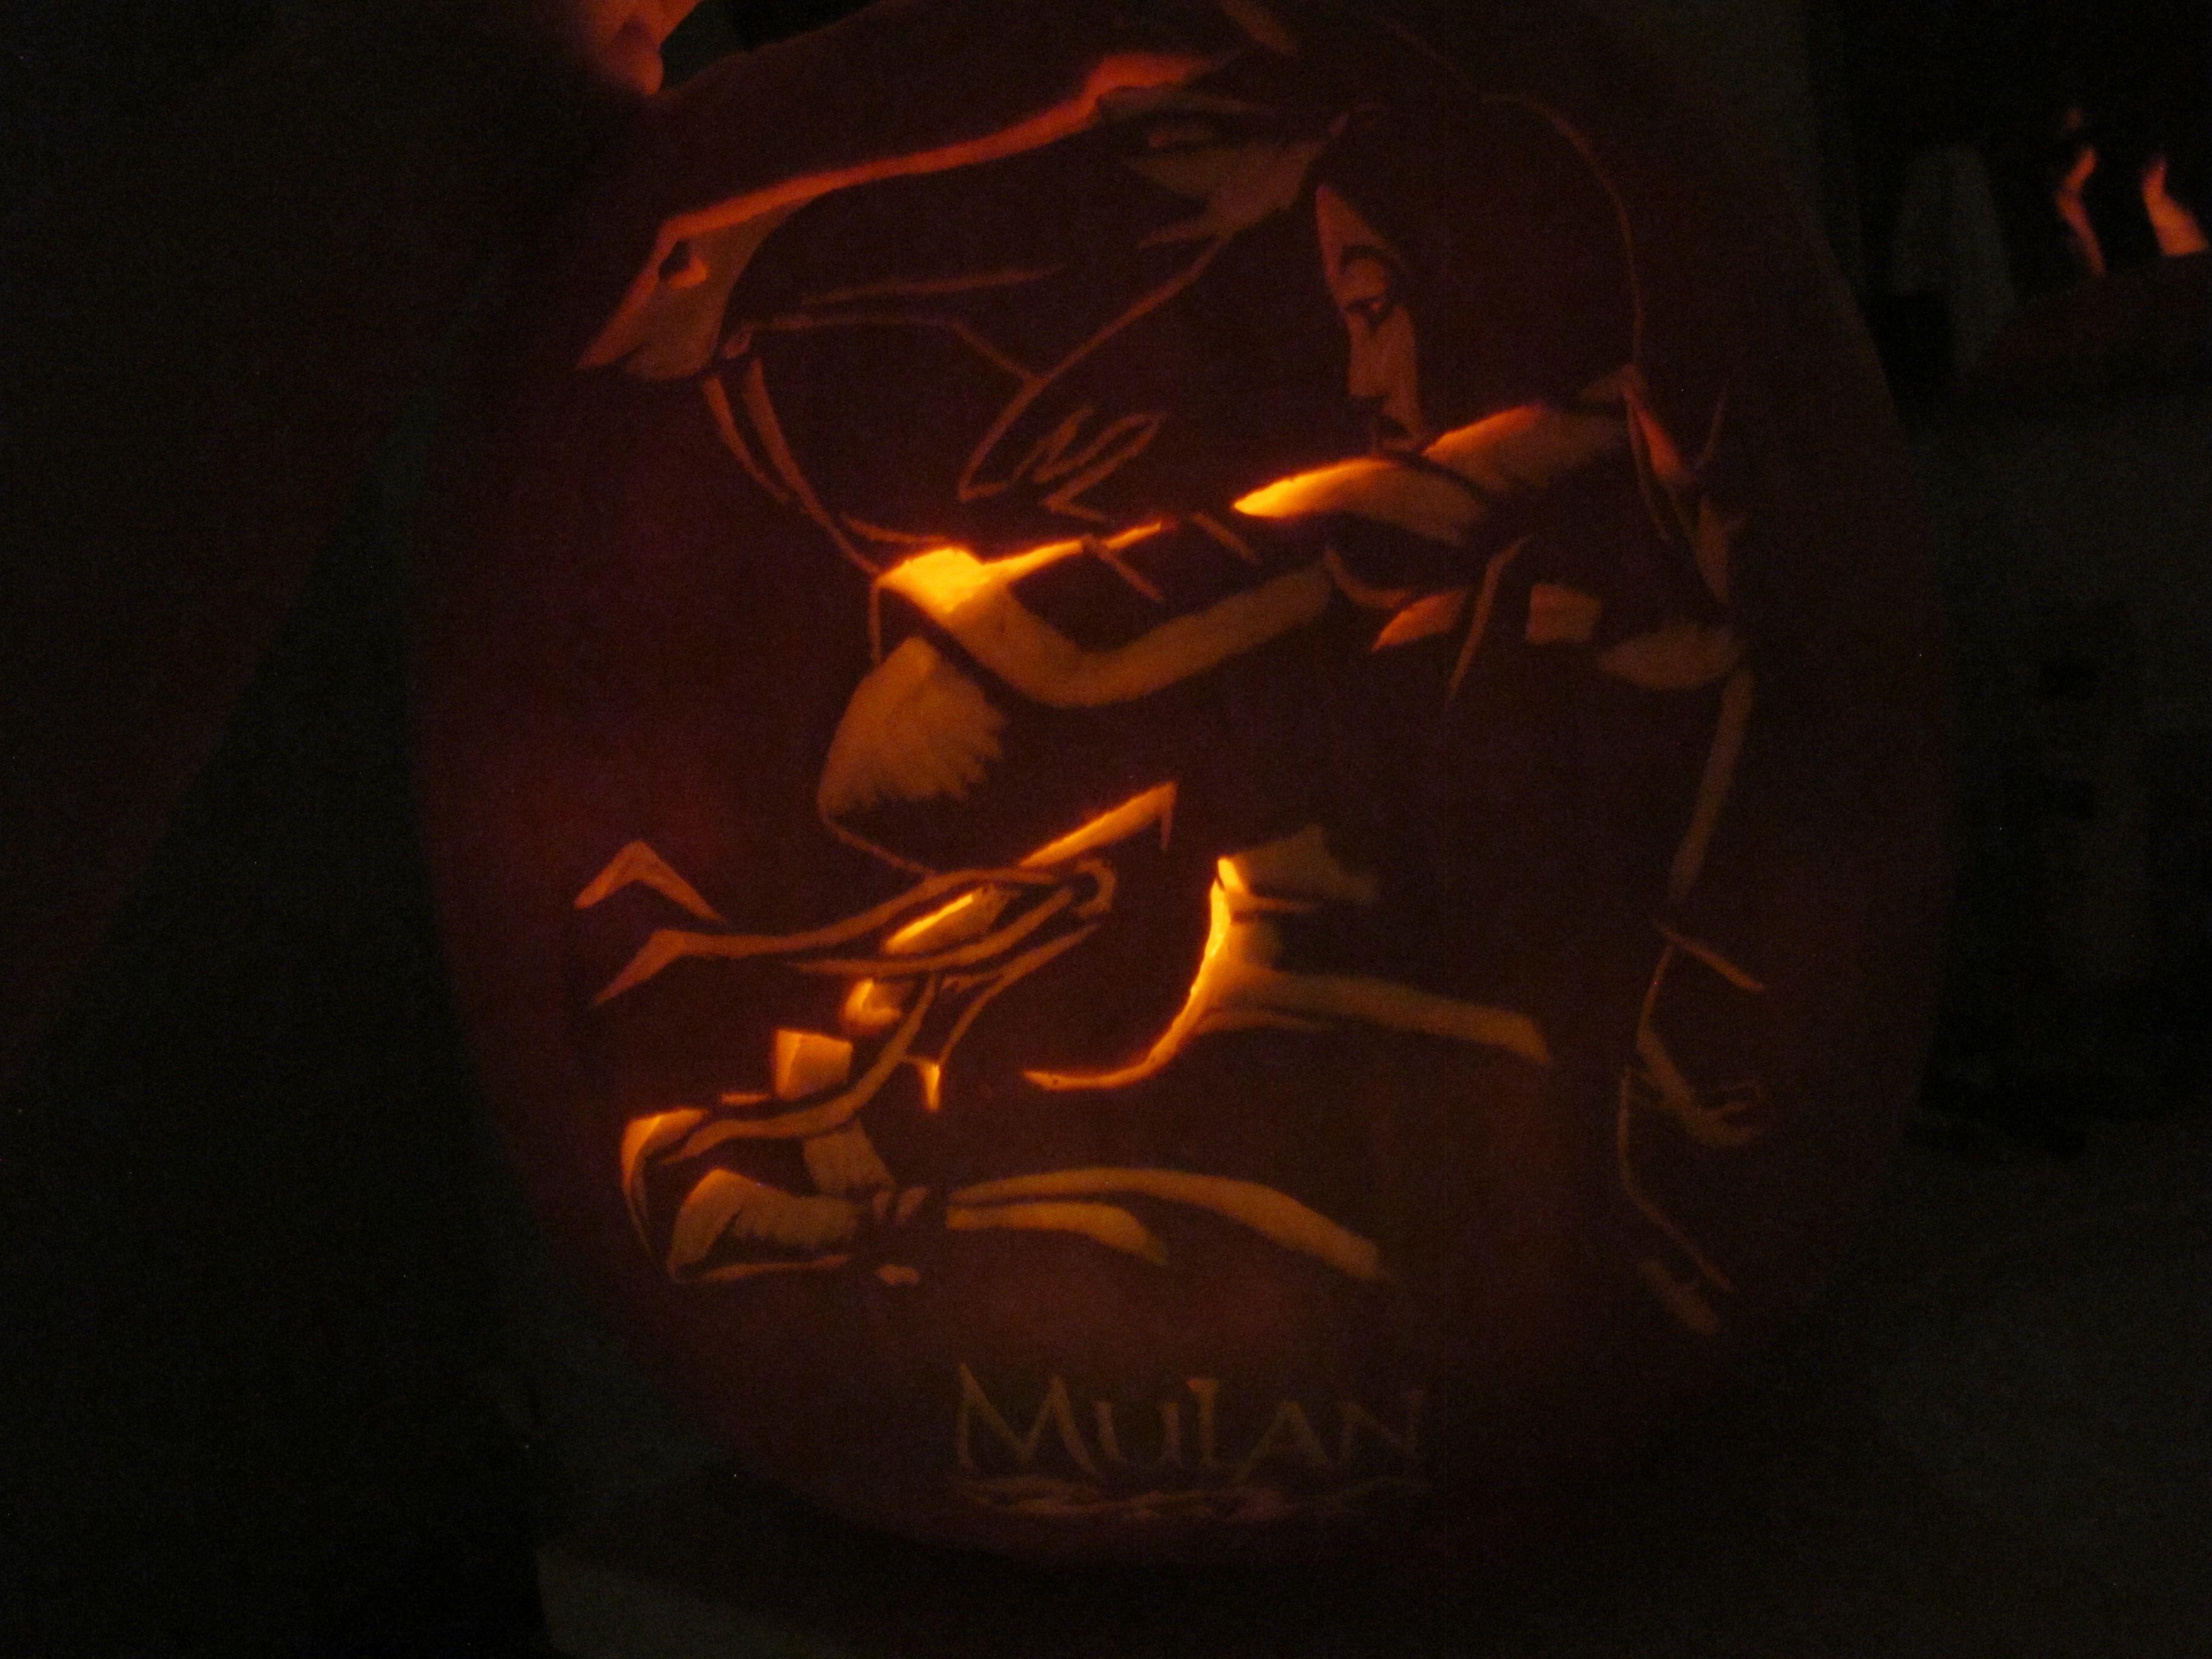 Wa walking dead pumpkin stencil - Mulan Pumpkin Carving For Halloween